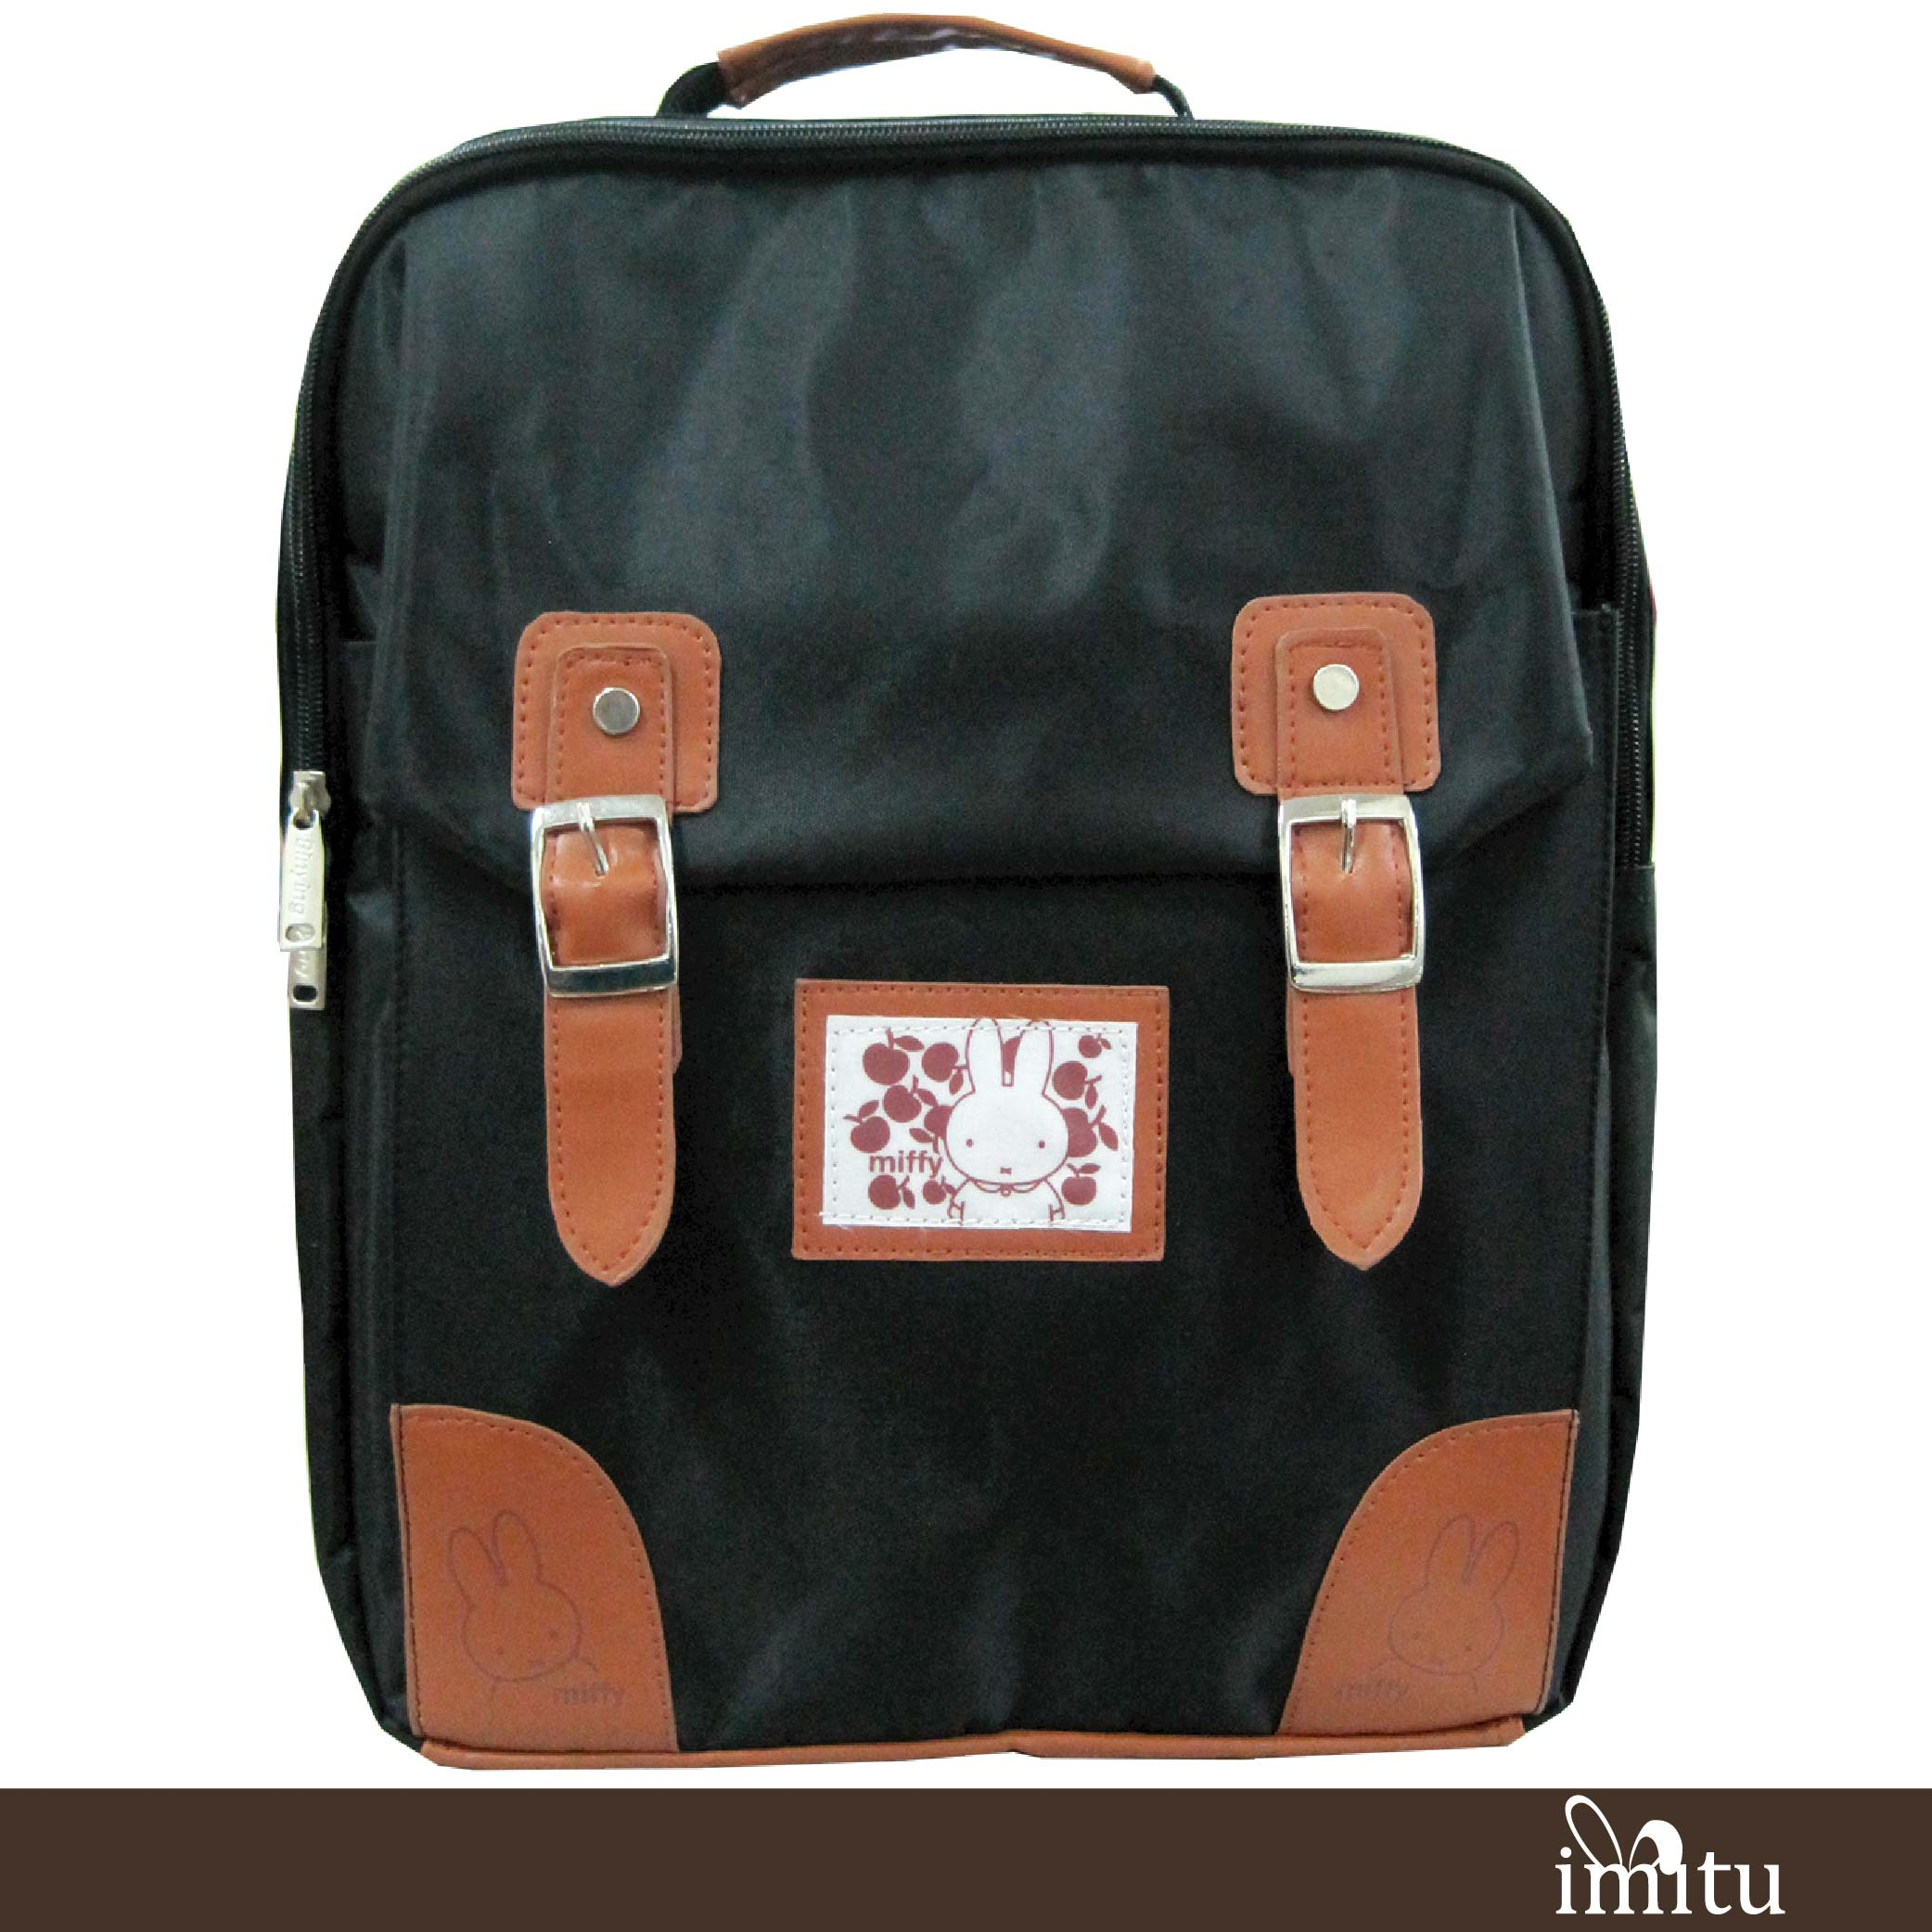 imitu 【Miffy 米飛】超輕巧護脊格紋護脊後背包(暗夜黑MI-5609)